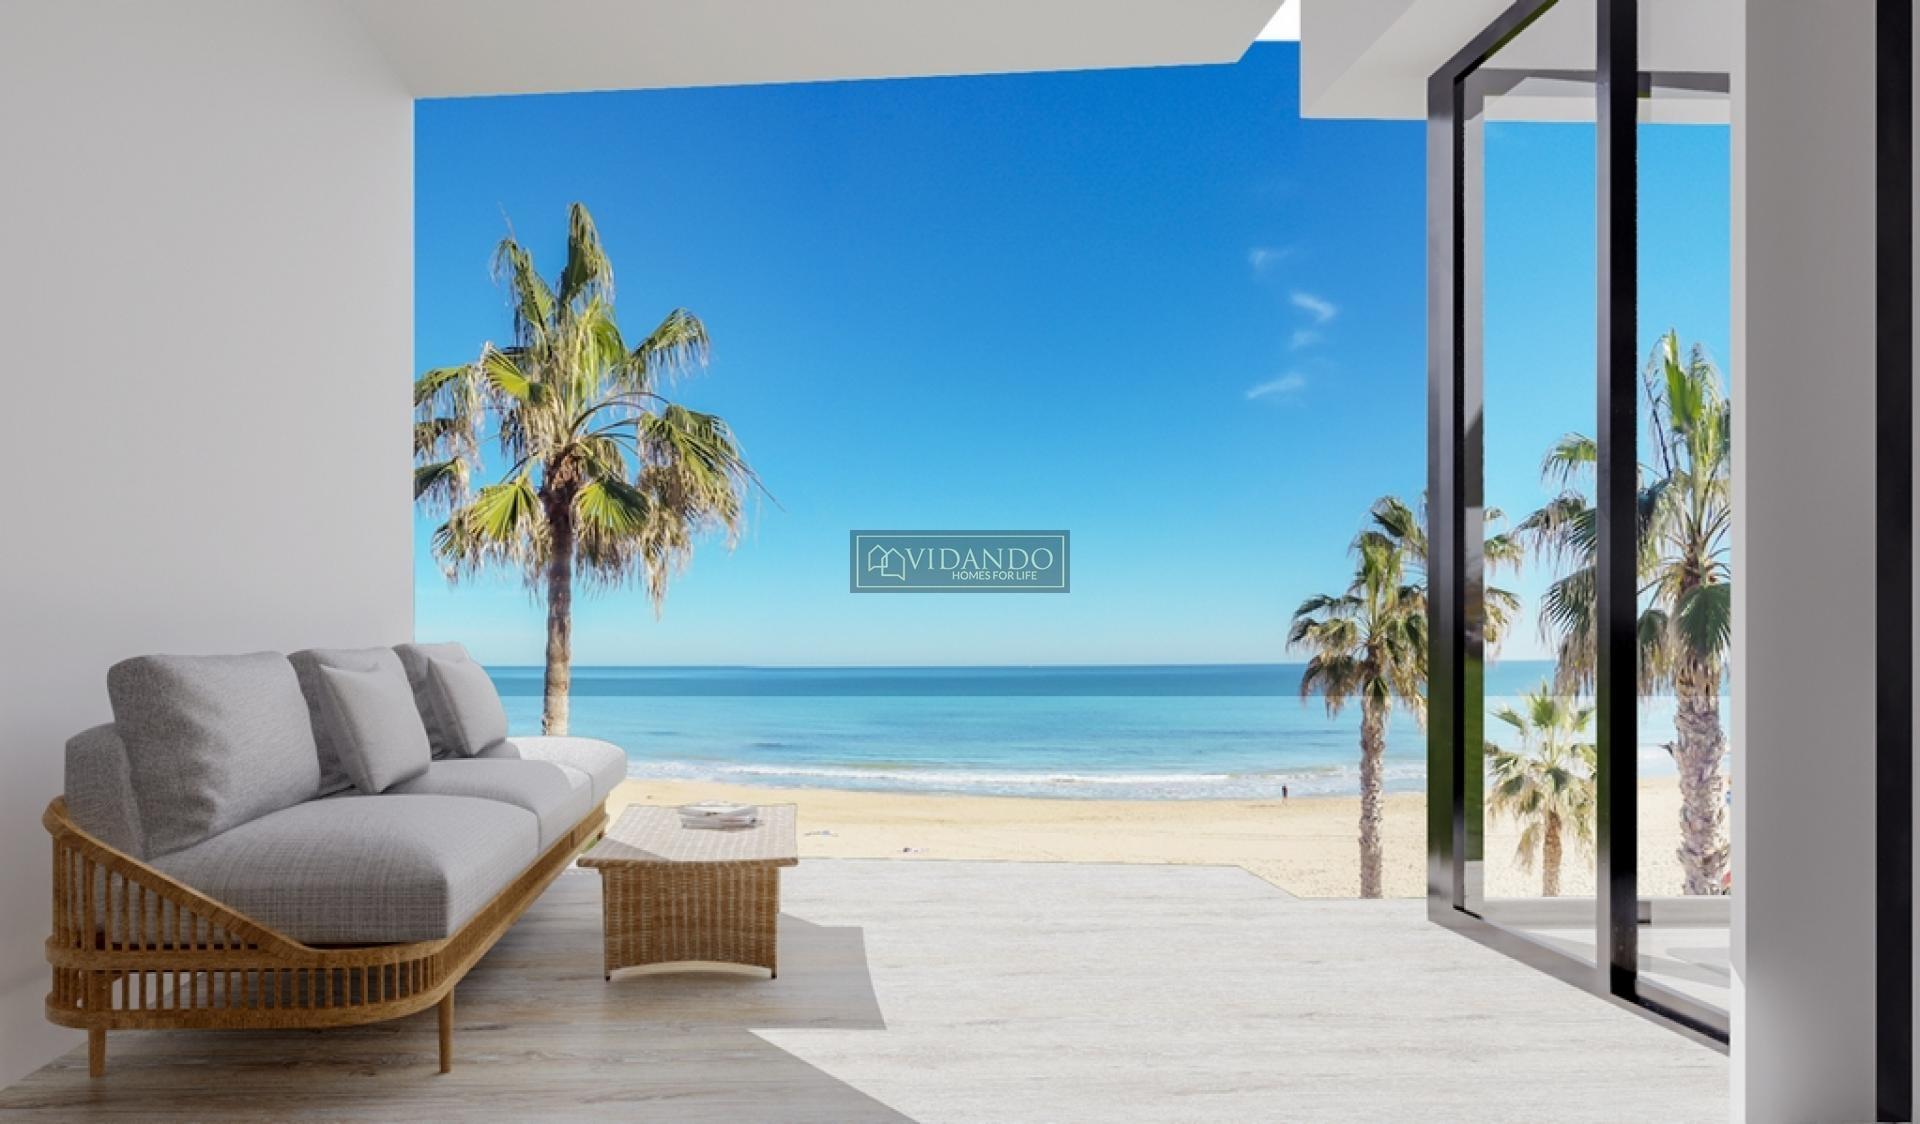 Apartments first beach line located in La Mata, Torrevieja in Vidando